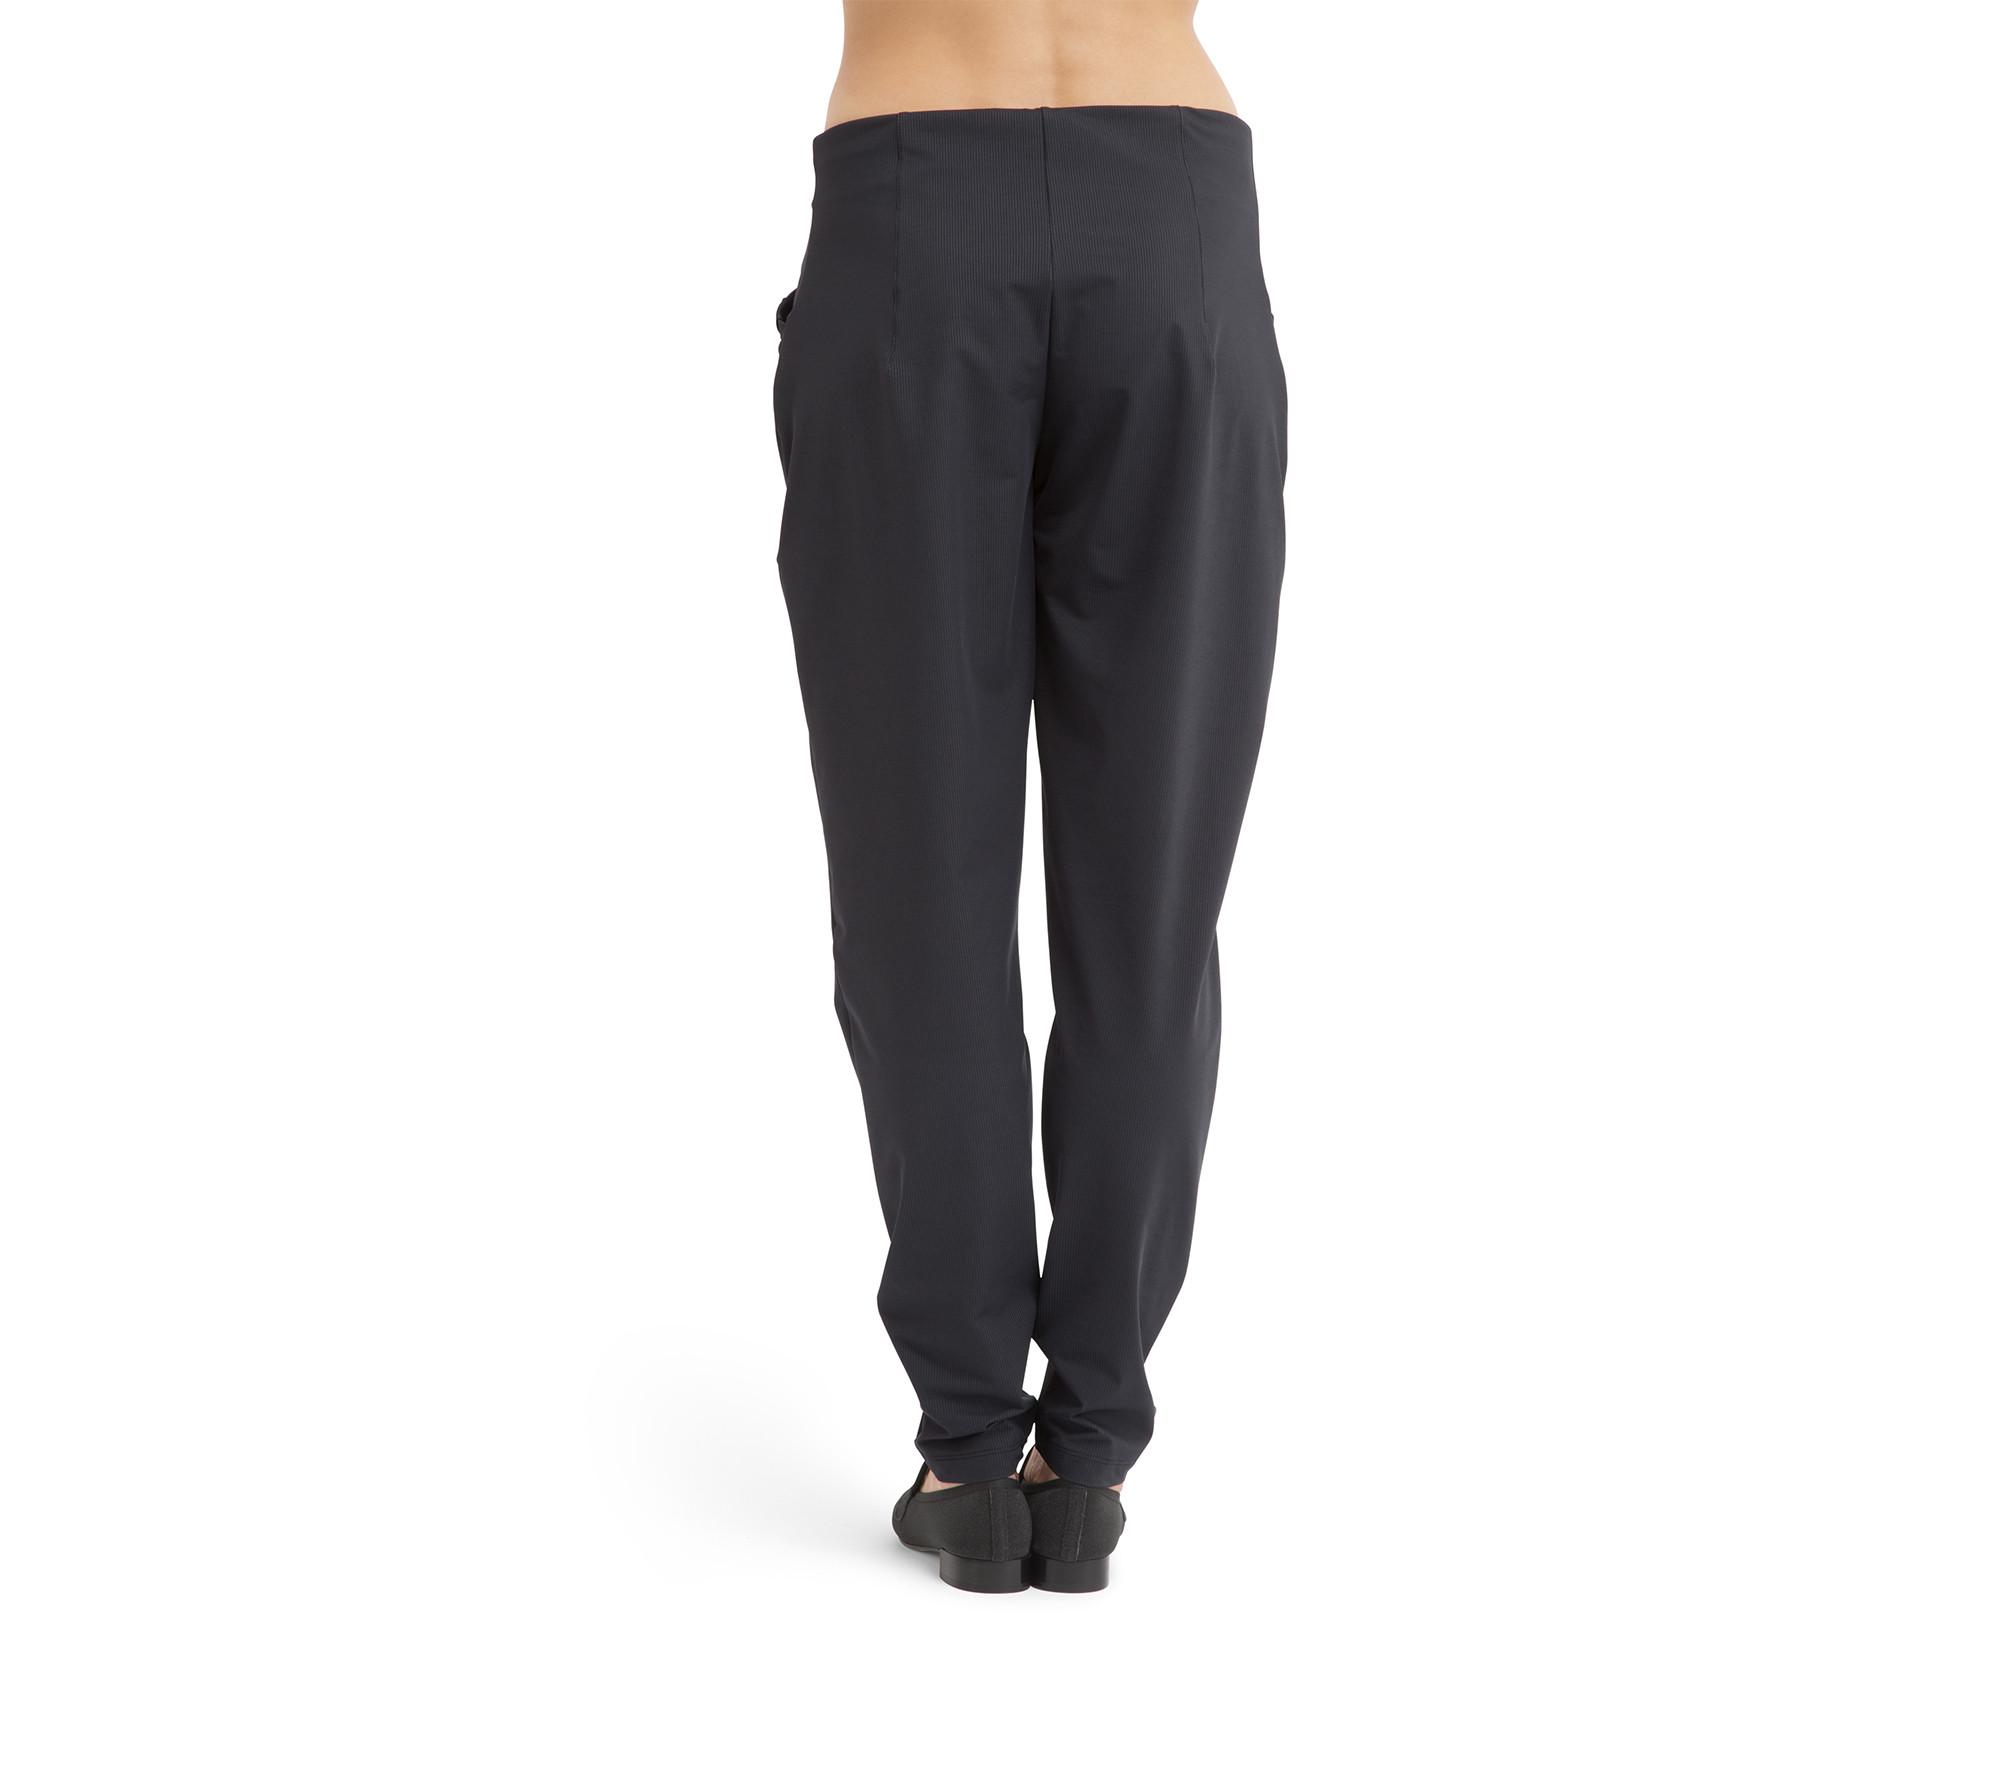 High waist stretch pants